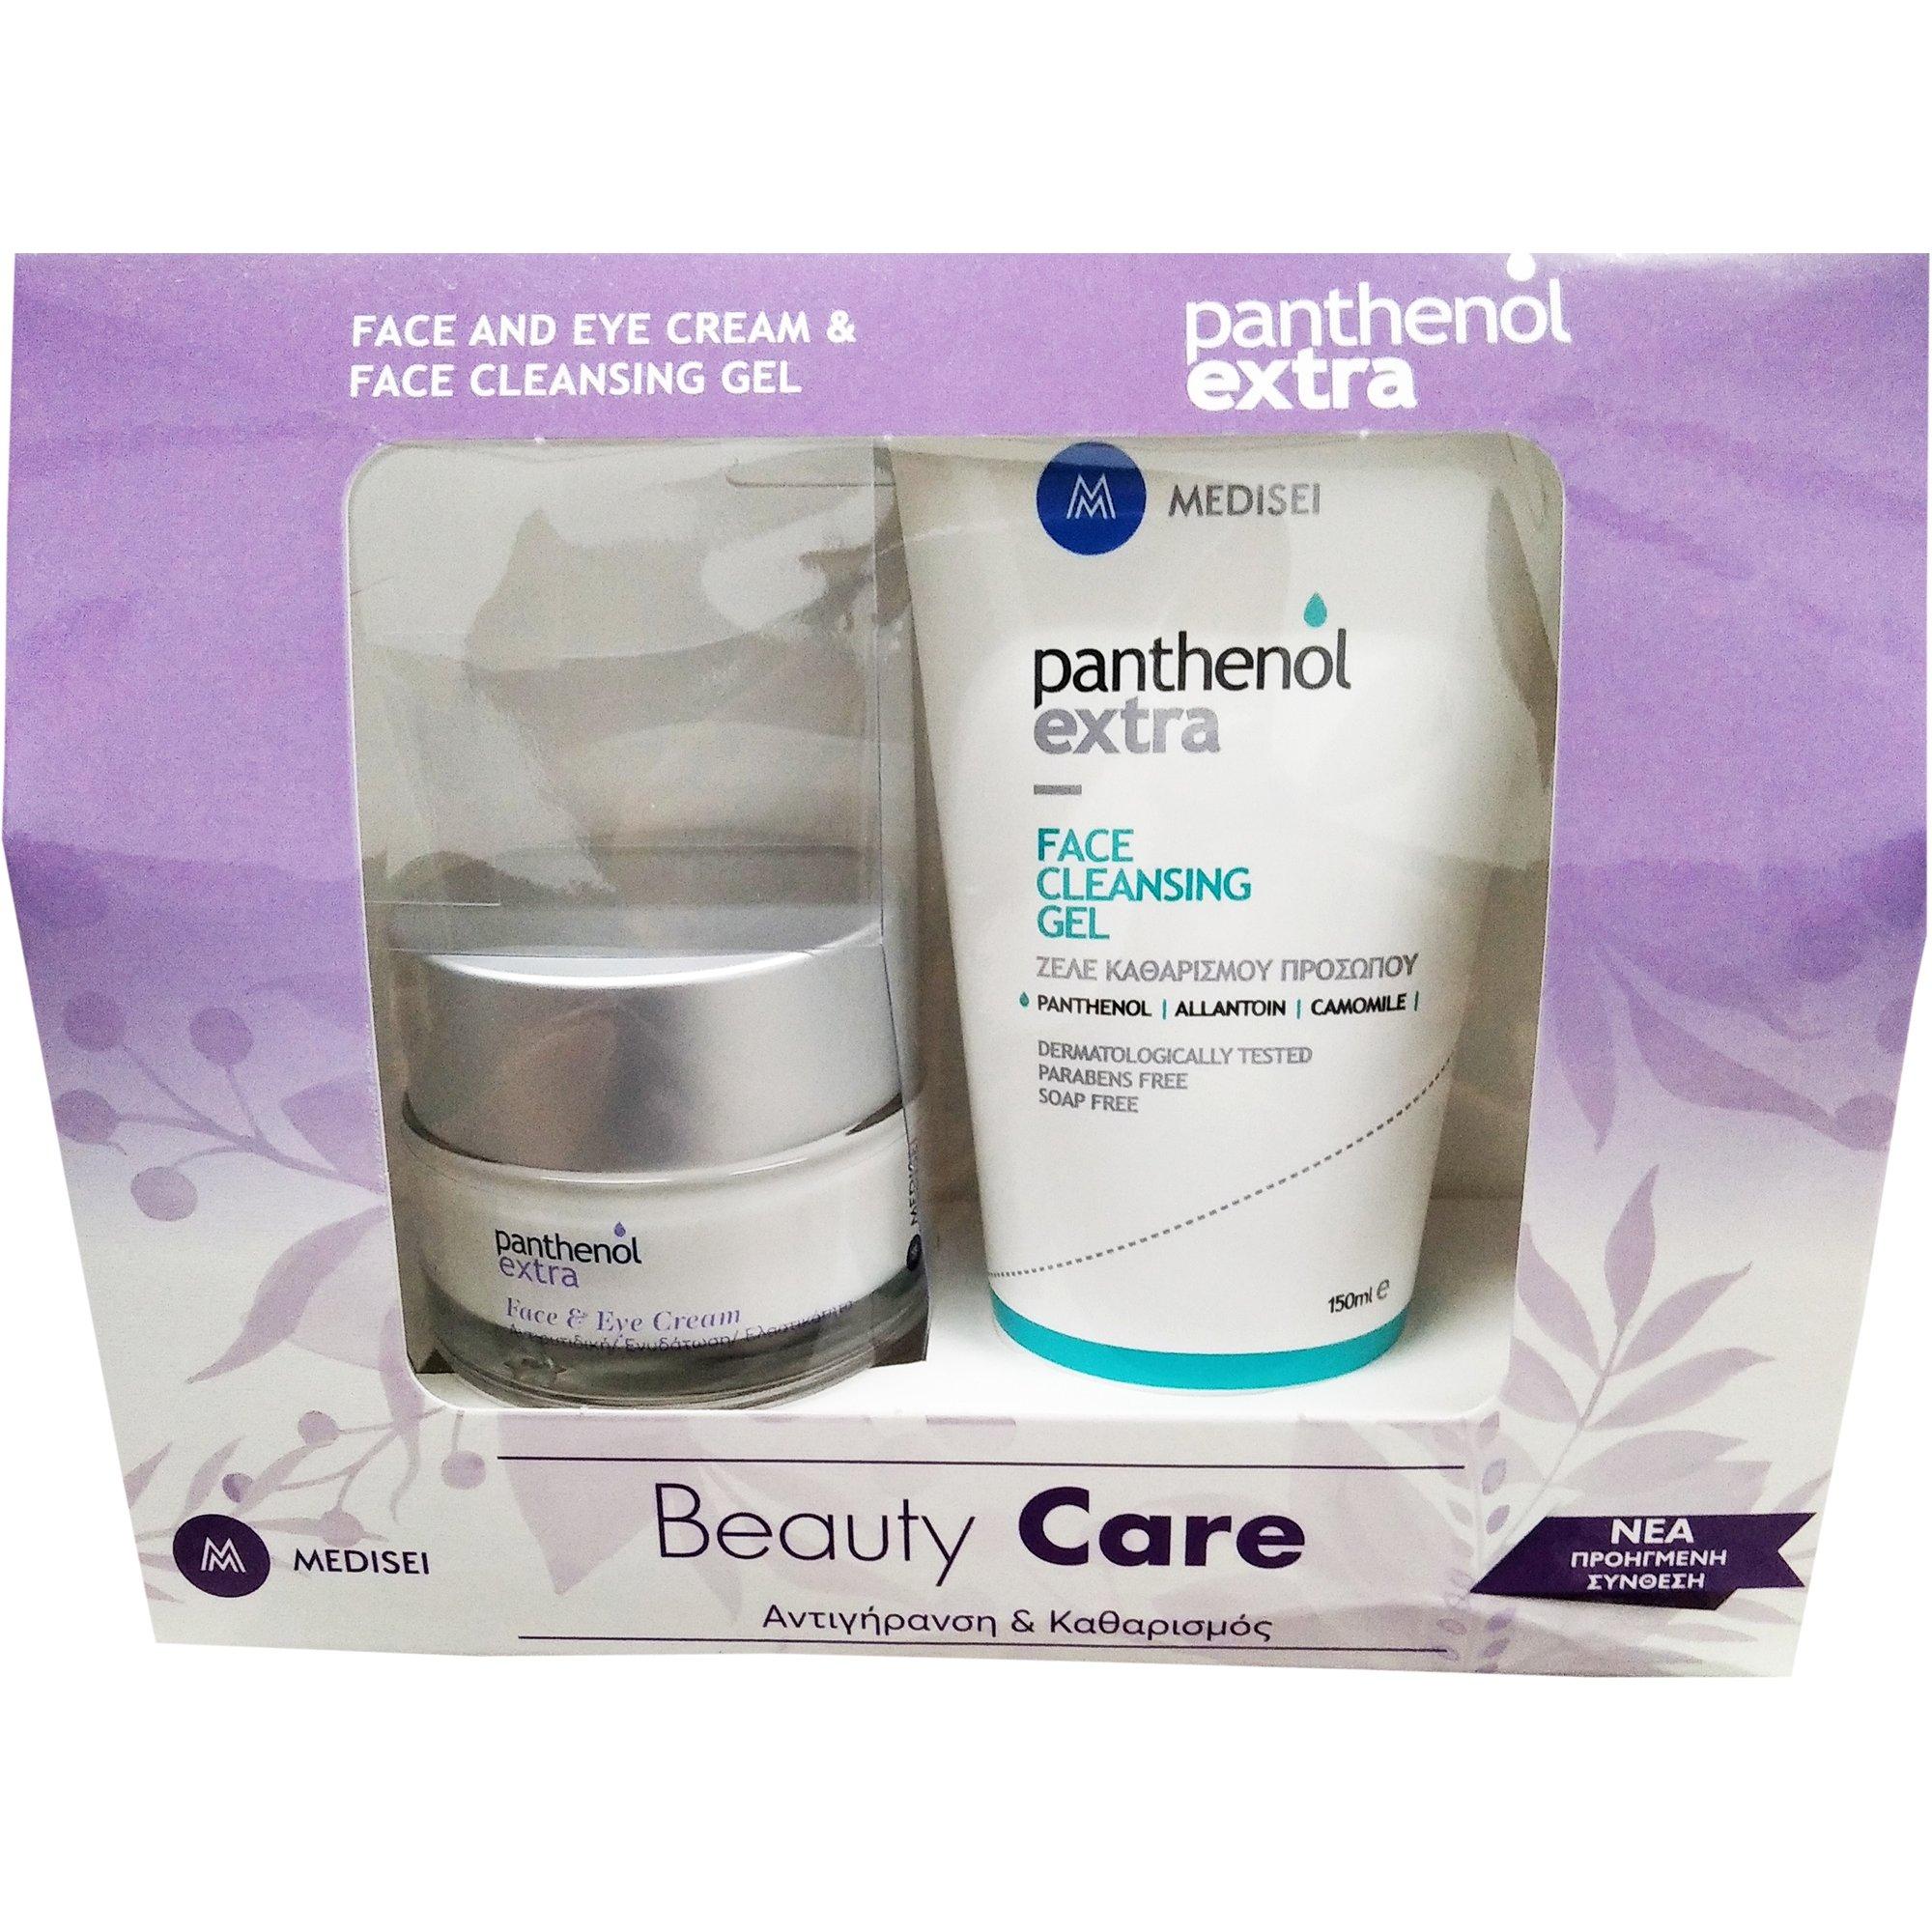 Medisei Panthenol Extra Face & Eye Κρέμα Προσώπου και Ματιών 50ml & Face Cleancing Gel Καθαρίζει και Δροσίζει το Πρόσωπο 150ml